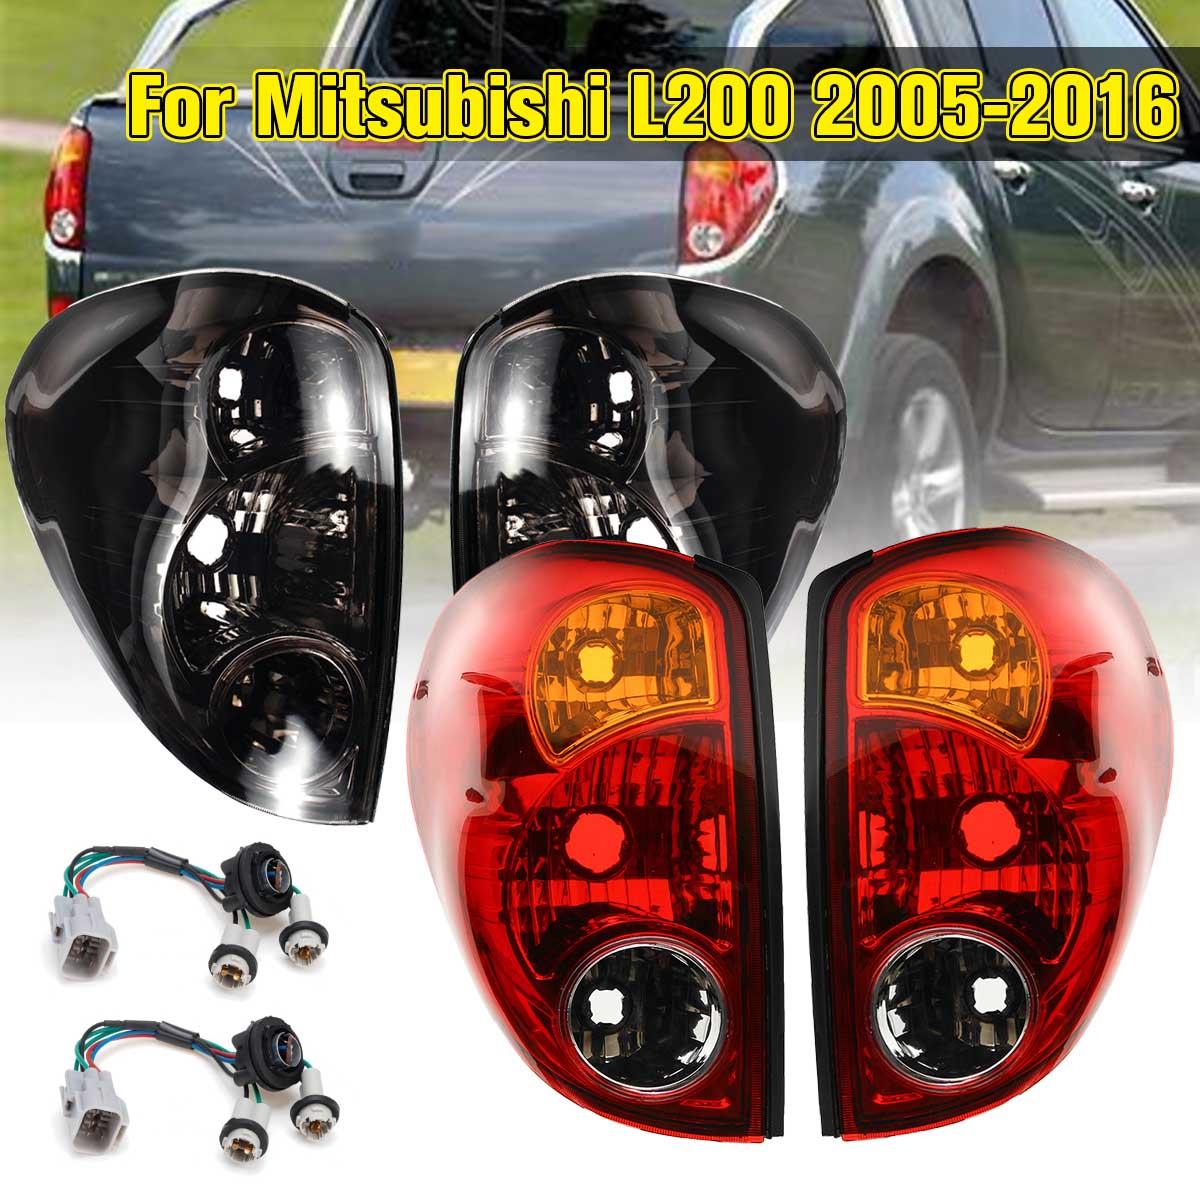 Luces traseras de vehículo para Mitsubishi L200 Triton Colt 2005-2016, 1 par, luces traseras, freno, con cable de reemplazo, humo